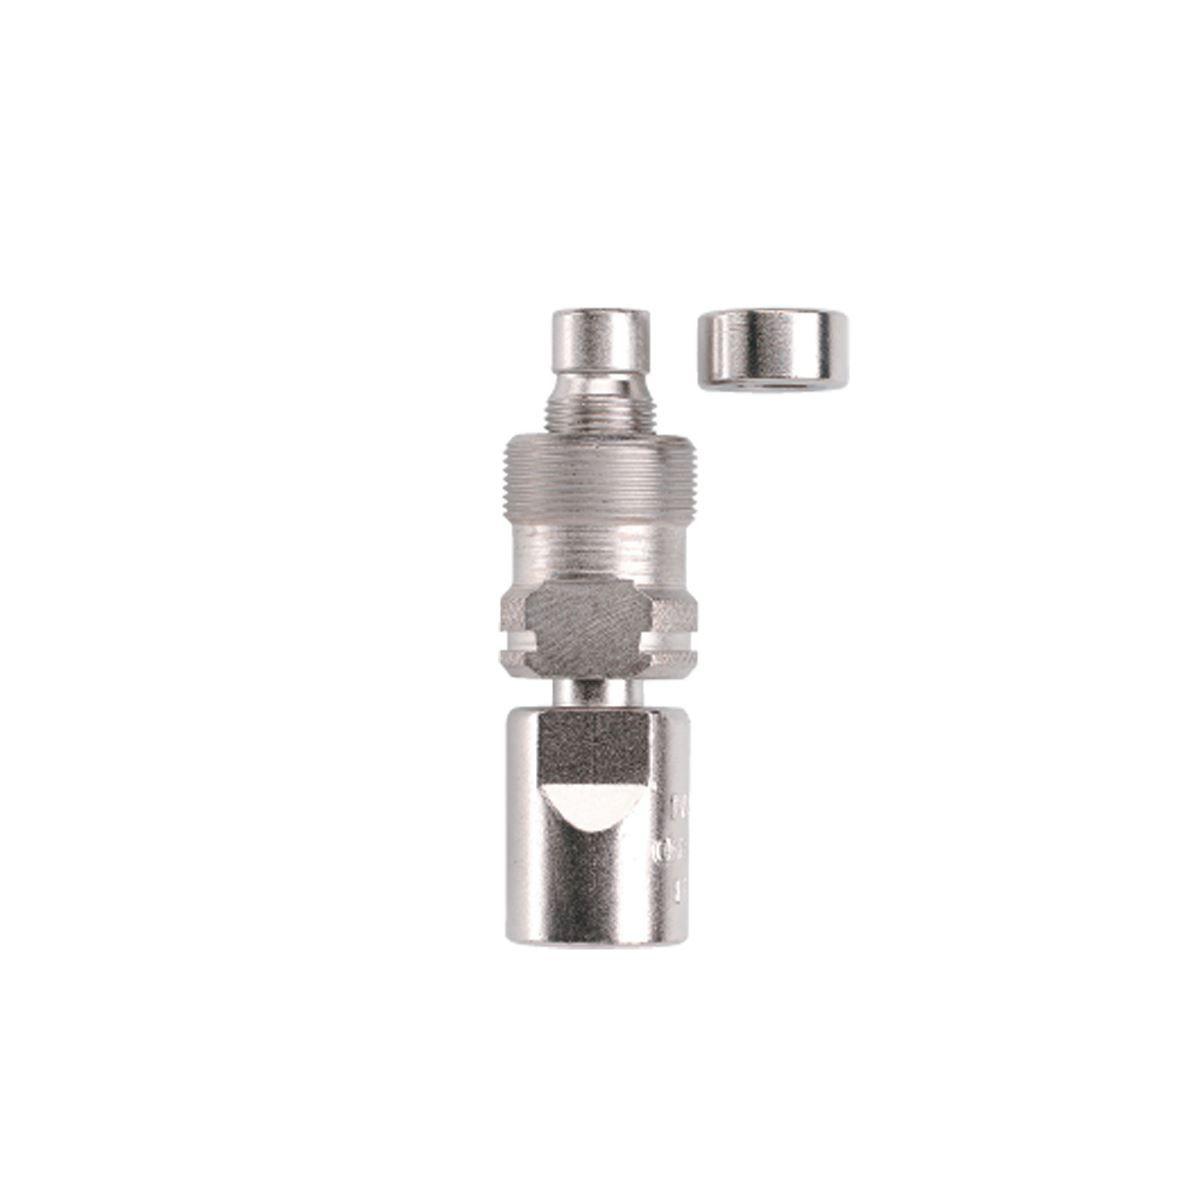 Cyclo 14Mm Cotterless Crank Extractor: